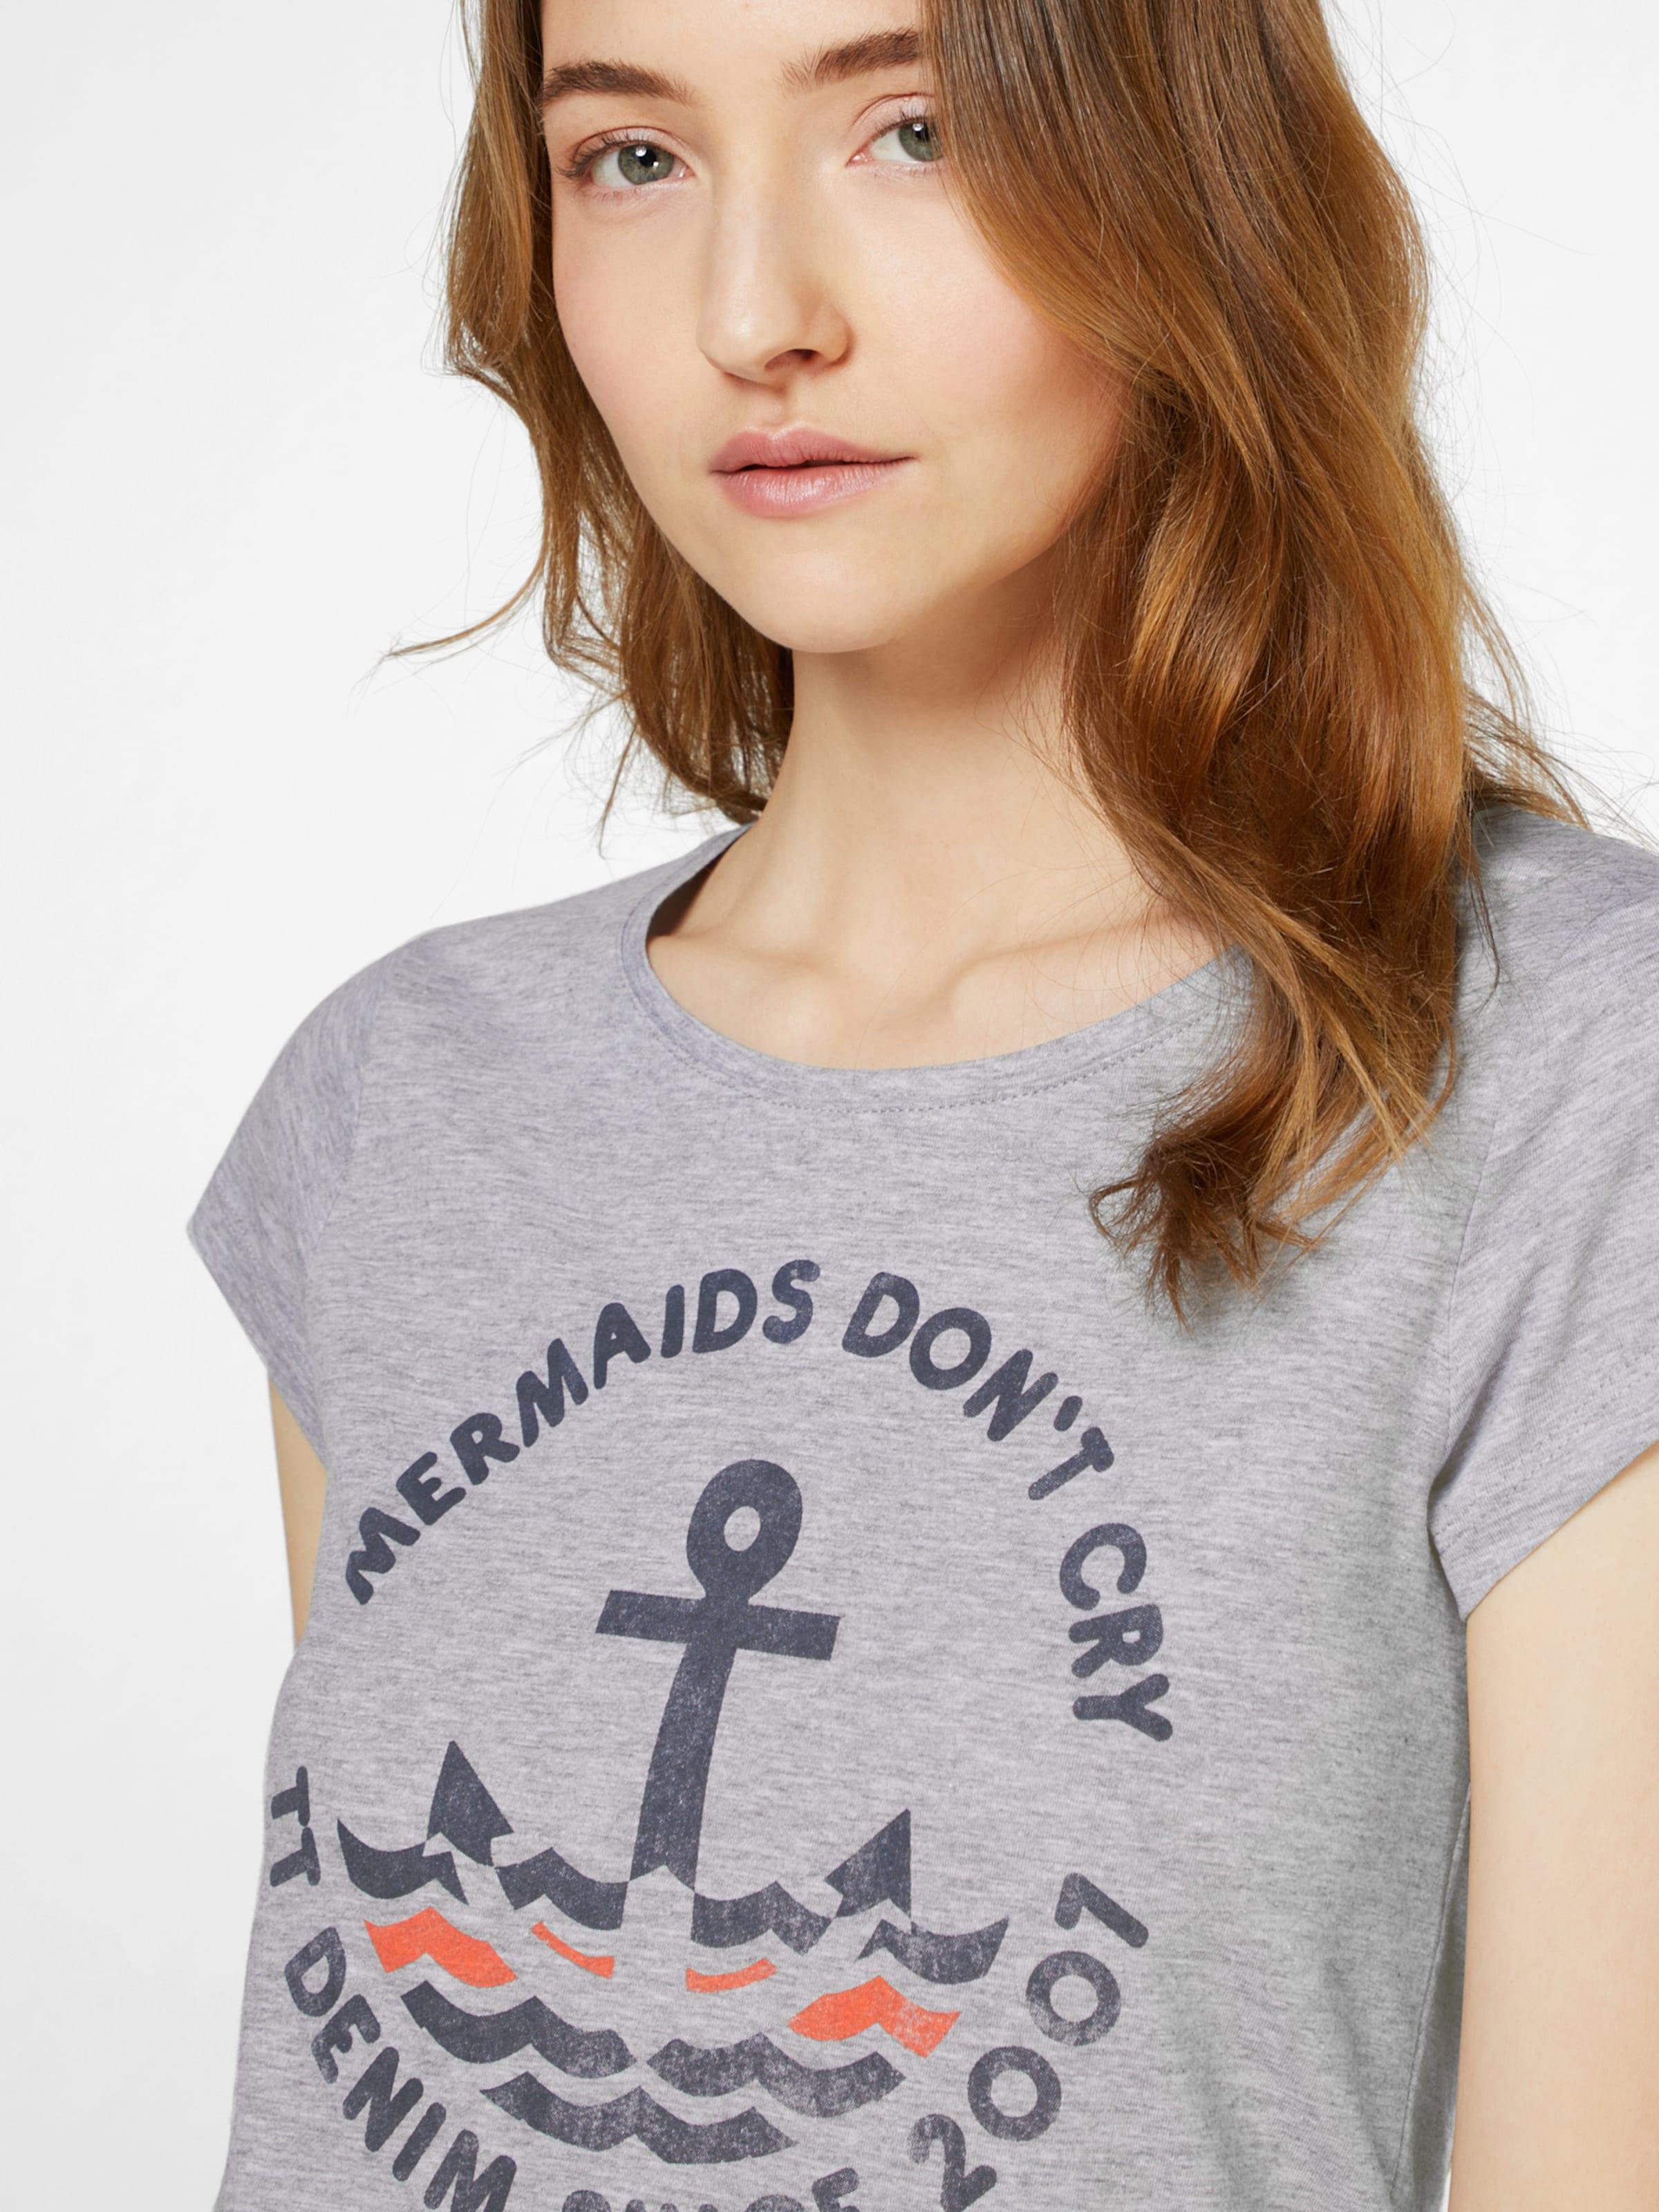 Sehr Günstiger Preis Verkauf Websites TOM TAILOR DENIM Print T-Shirt 38O5Y